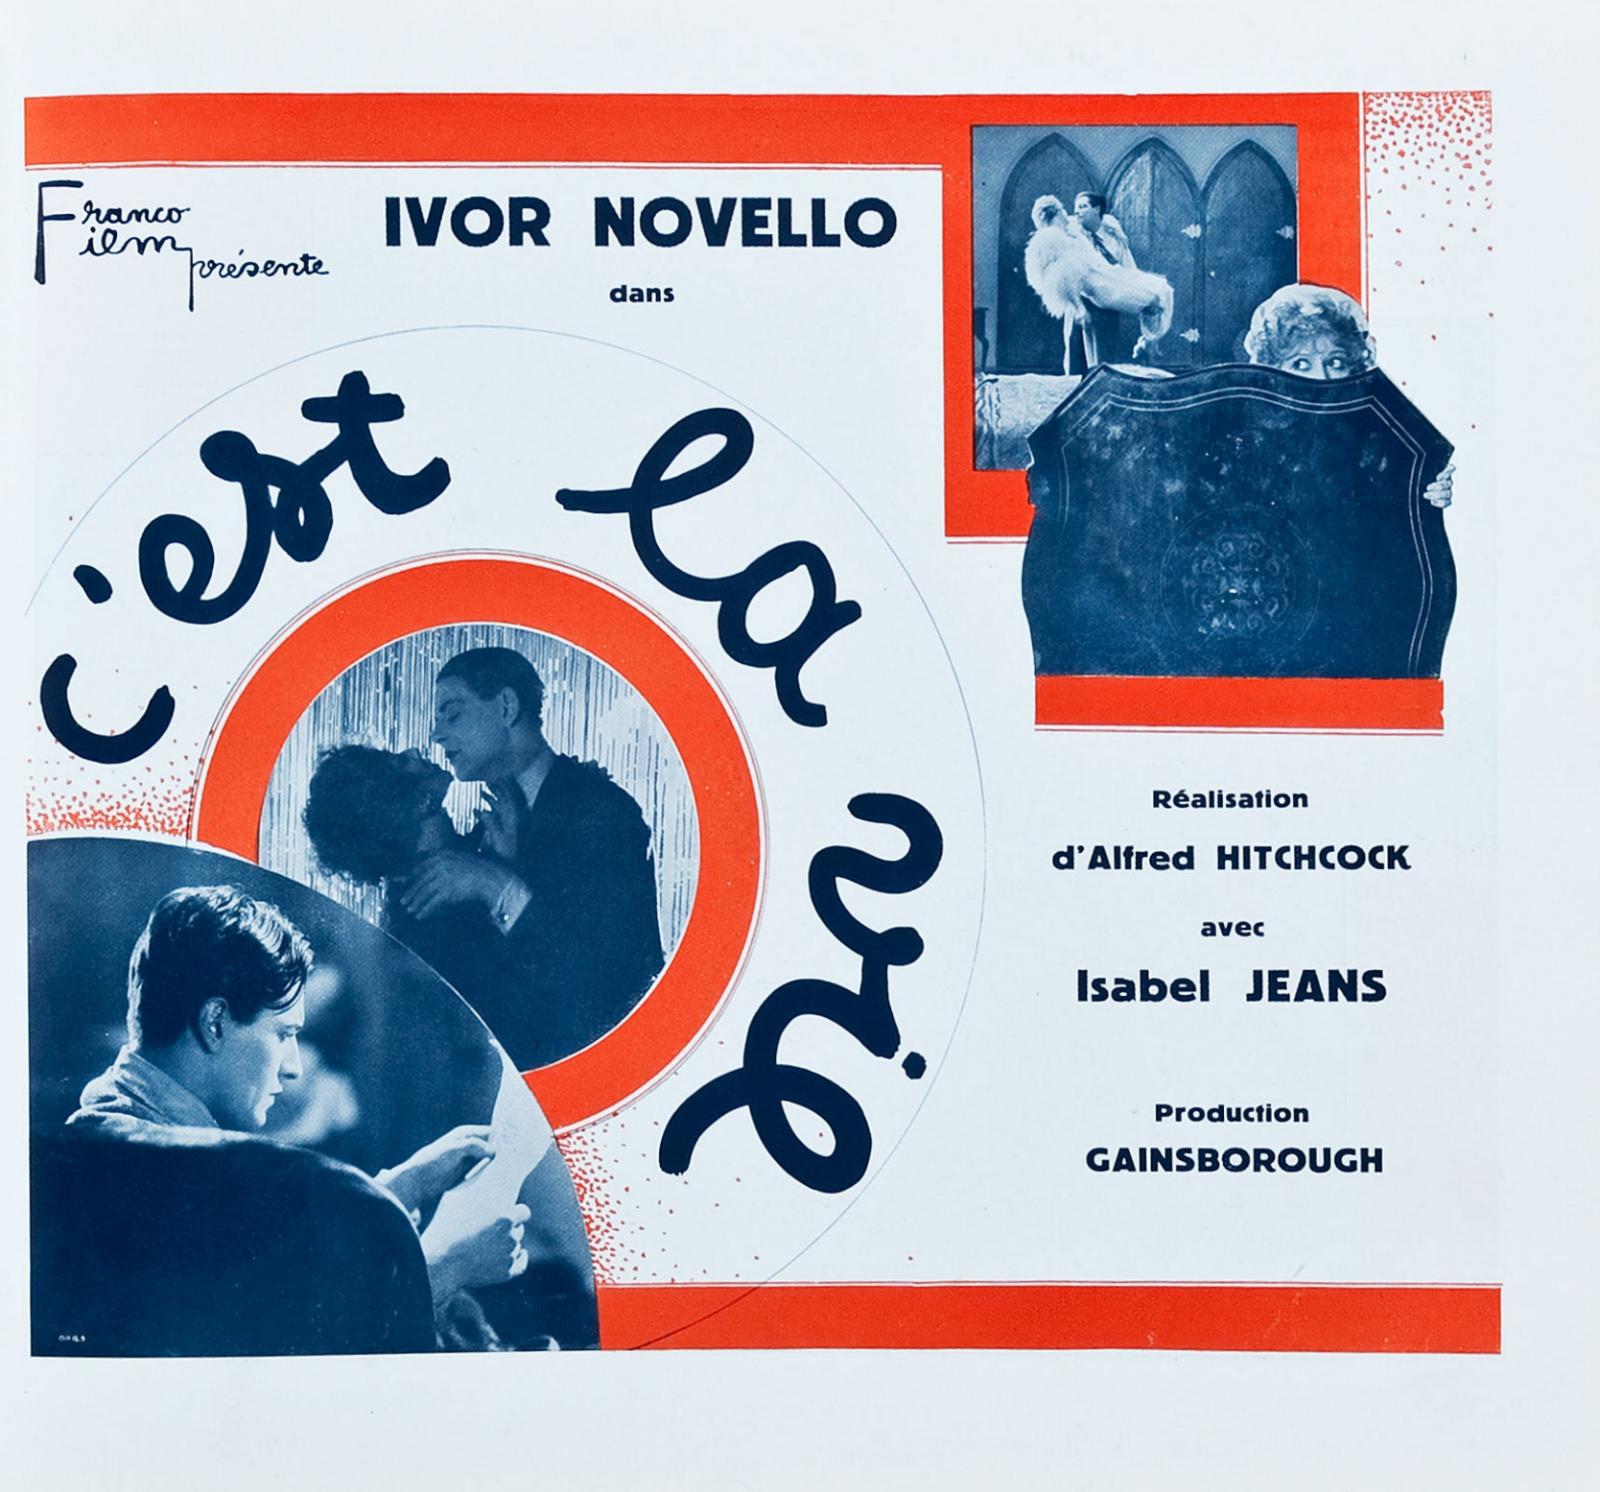 Downhill aka C'est la vie (1927, dir. Alfred Hitchcock) French pressbook